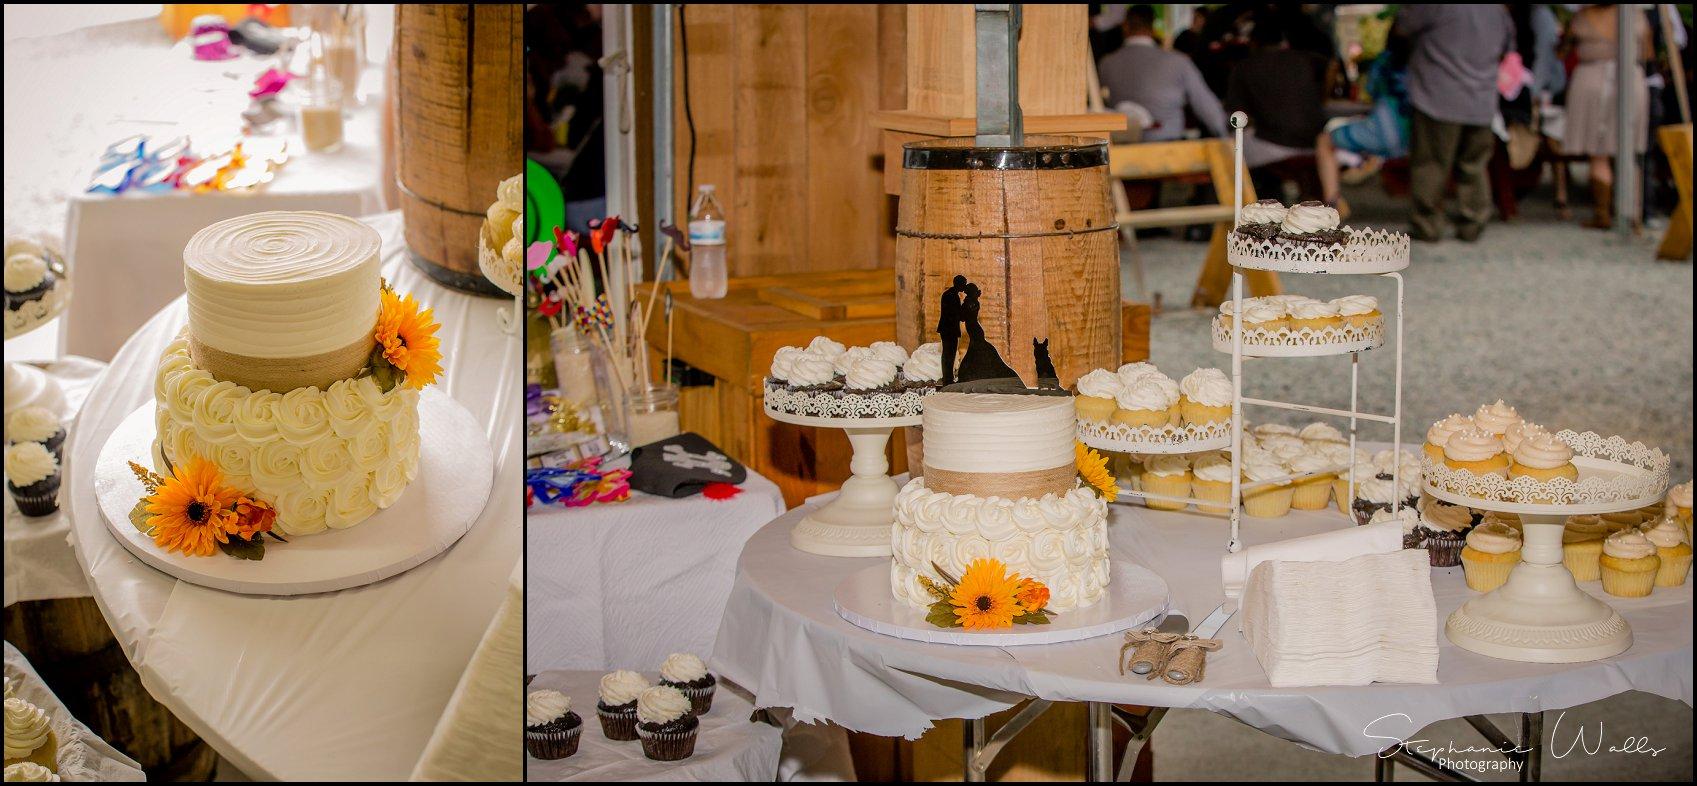 Kimble Wedding 157 Marlena & Allans | Snohomish Red Barn Events (Stocker Farms) | Snohomish, Wa Wedding Photographer